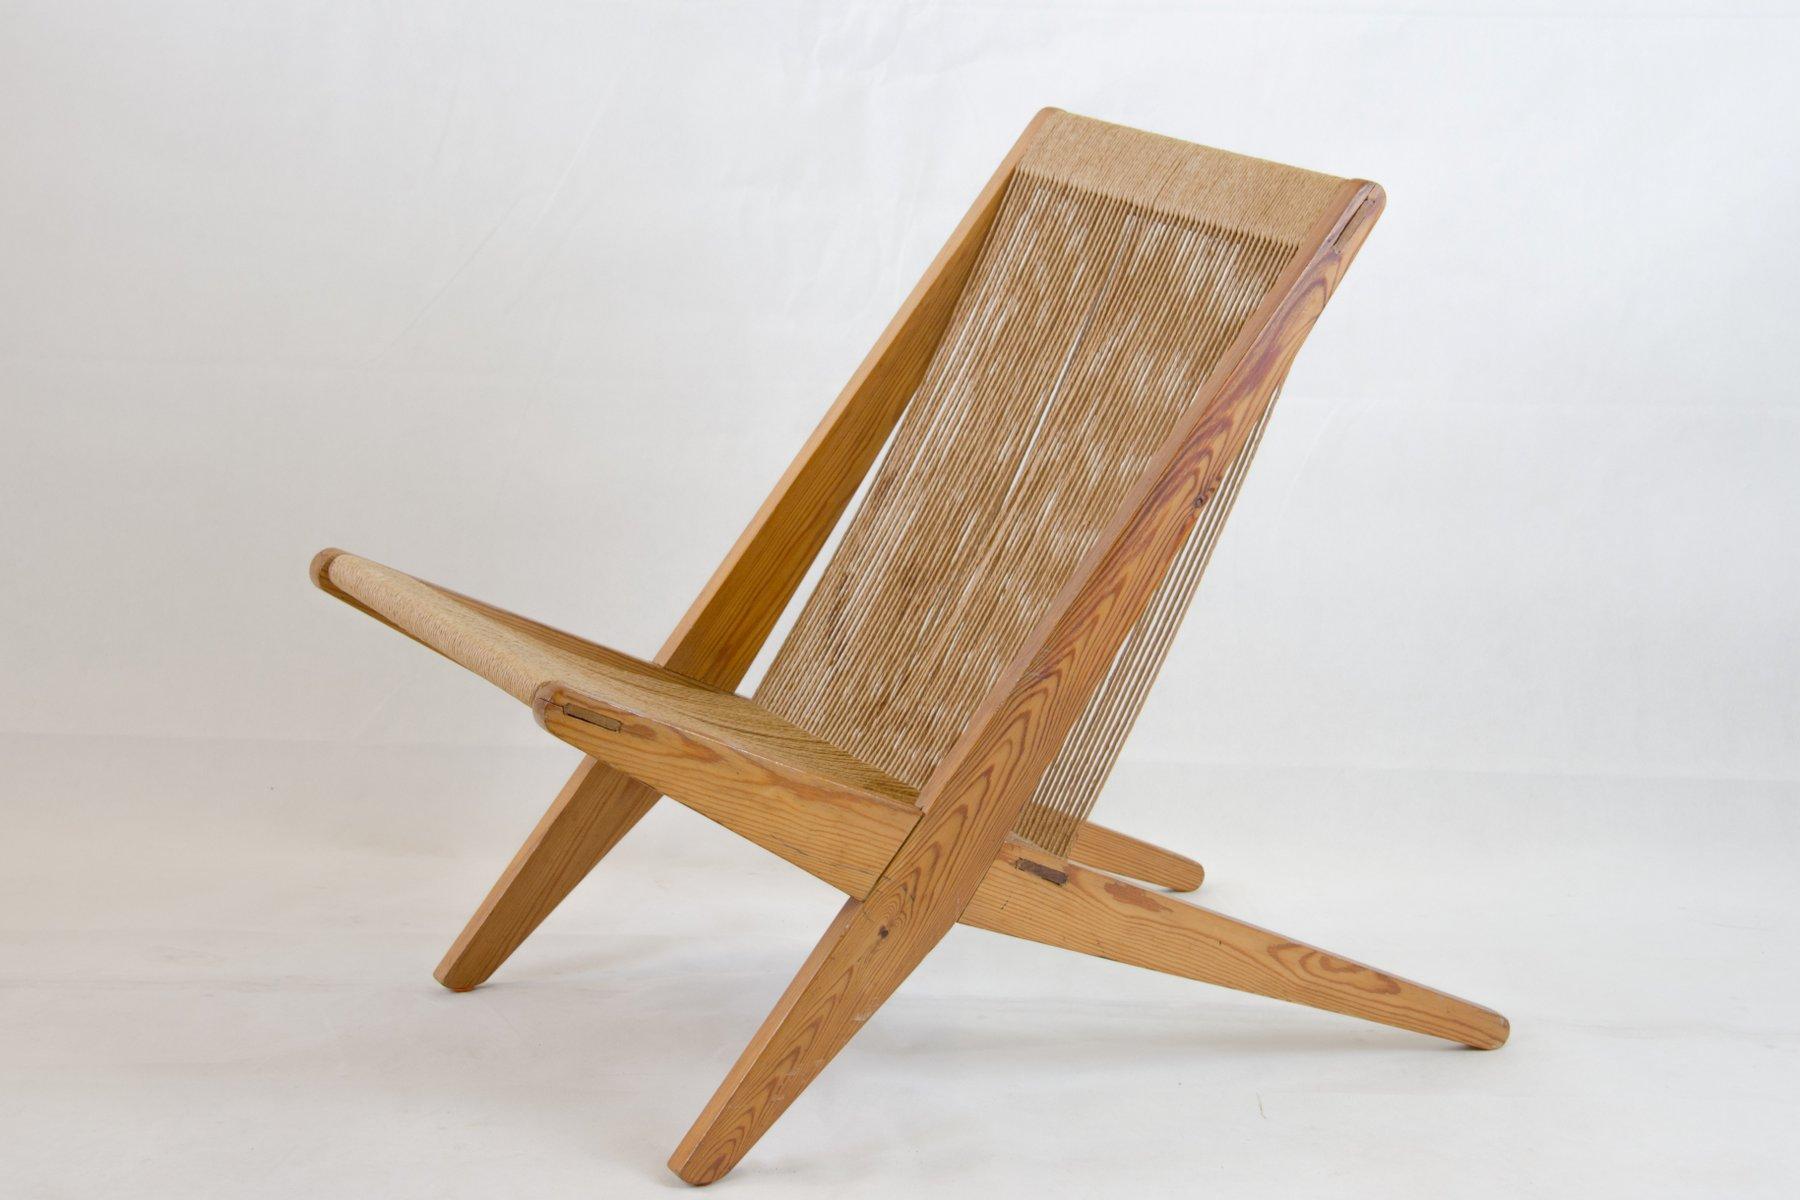 kiefernholz stuhl mit papierkordel bespannung bei pamono kaufen. Black Bedroom Furniture Sets. Home Design Ideas